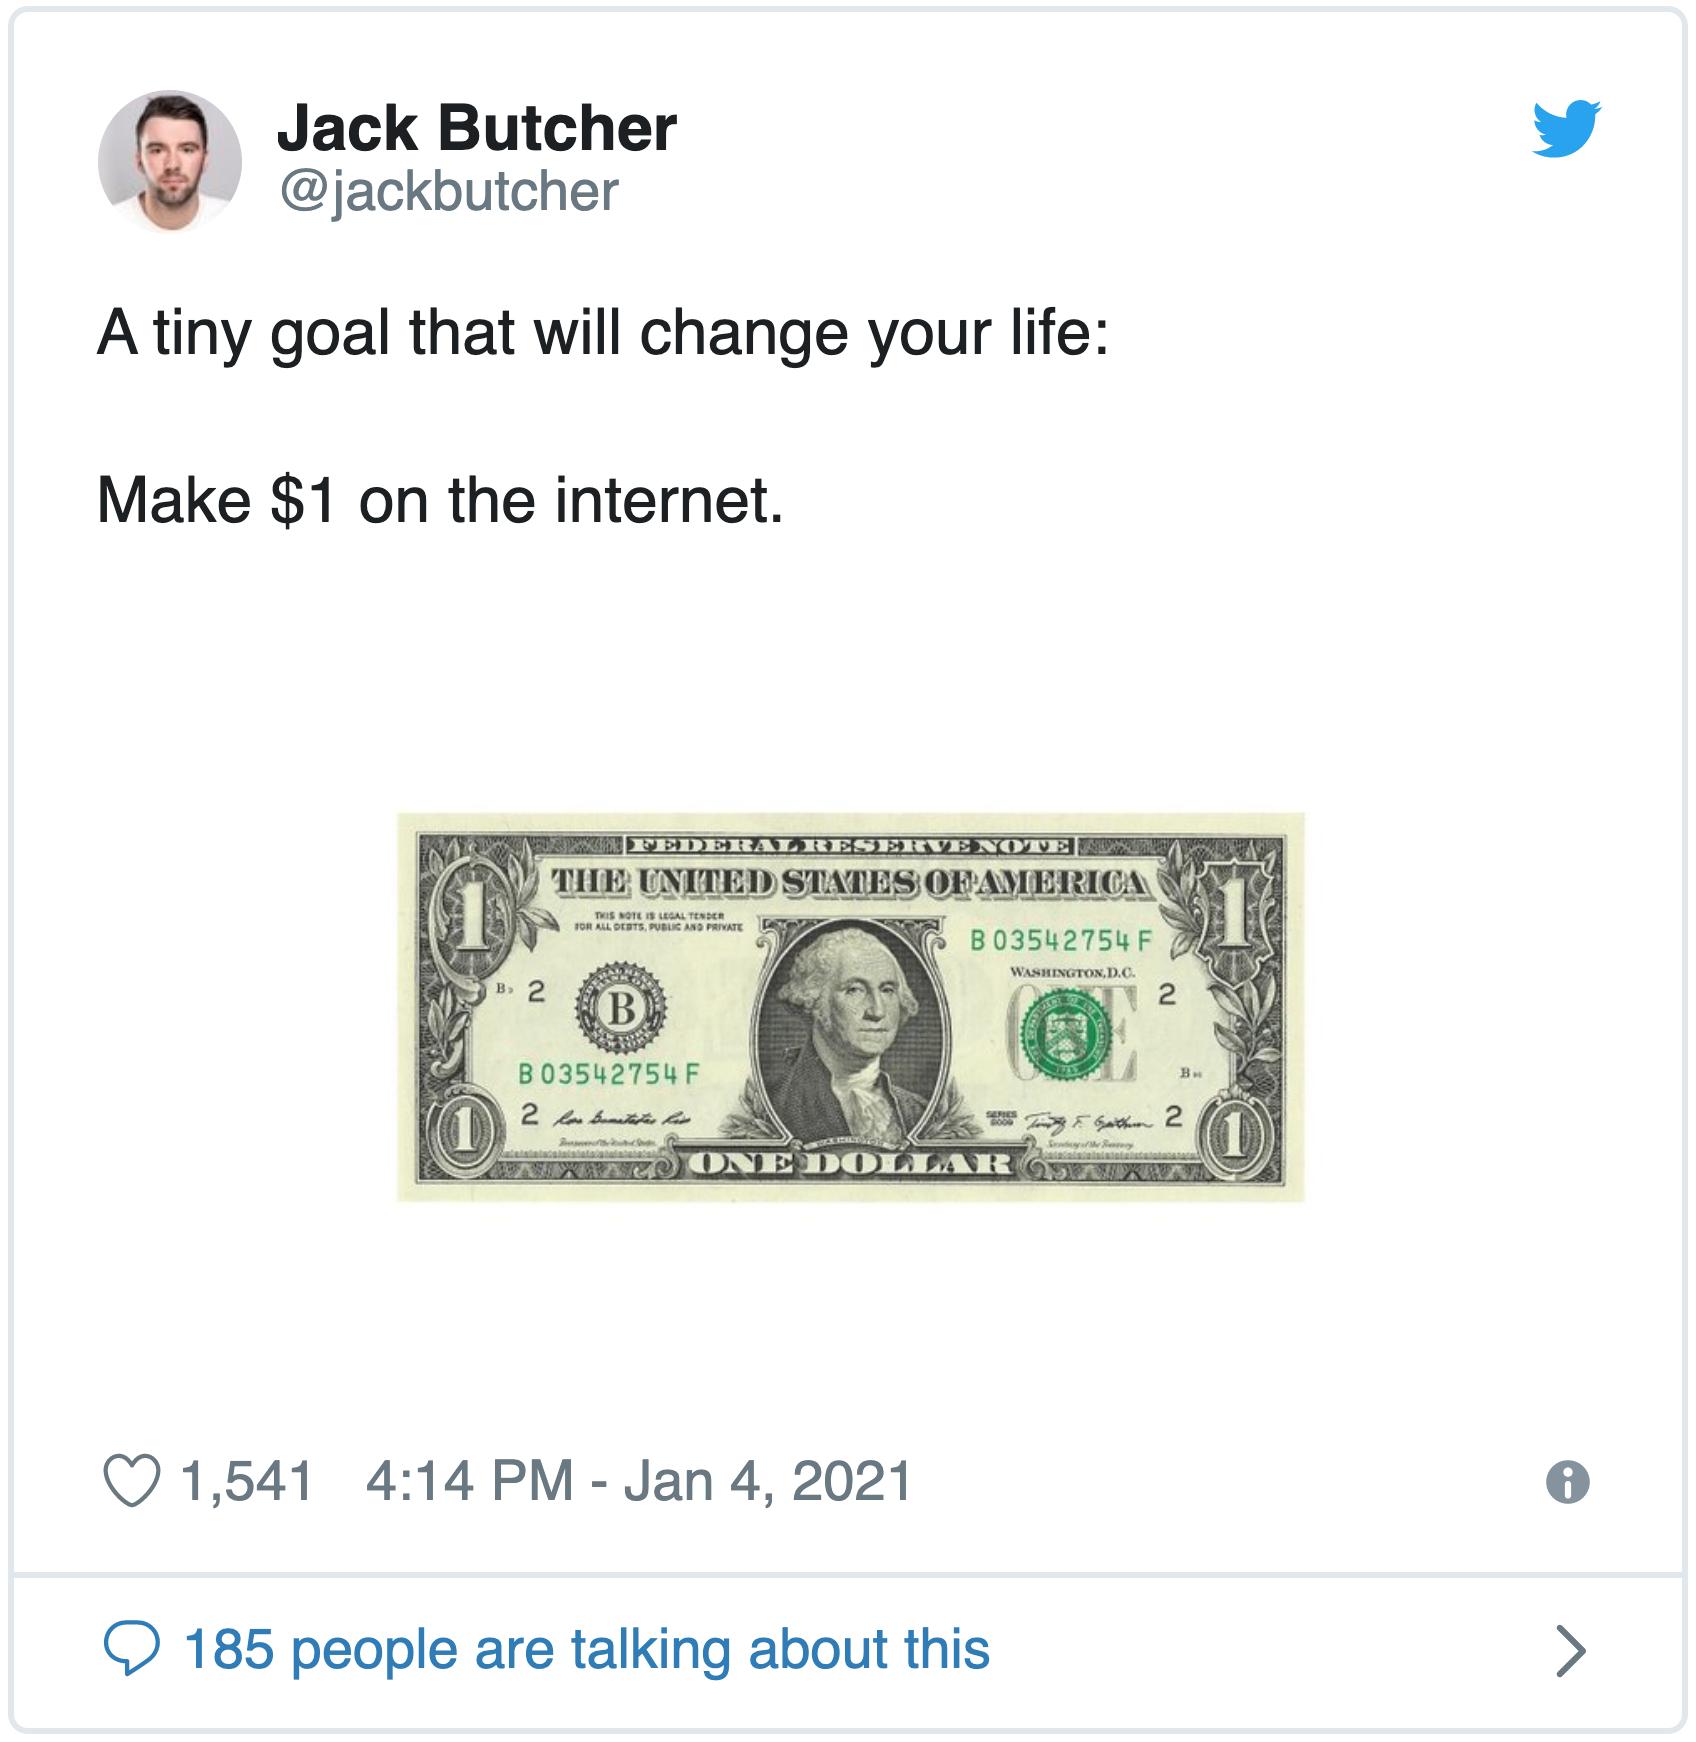 Jack Butcher on Twitter